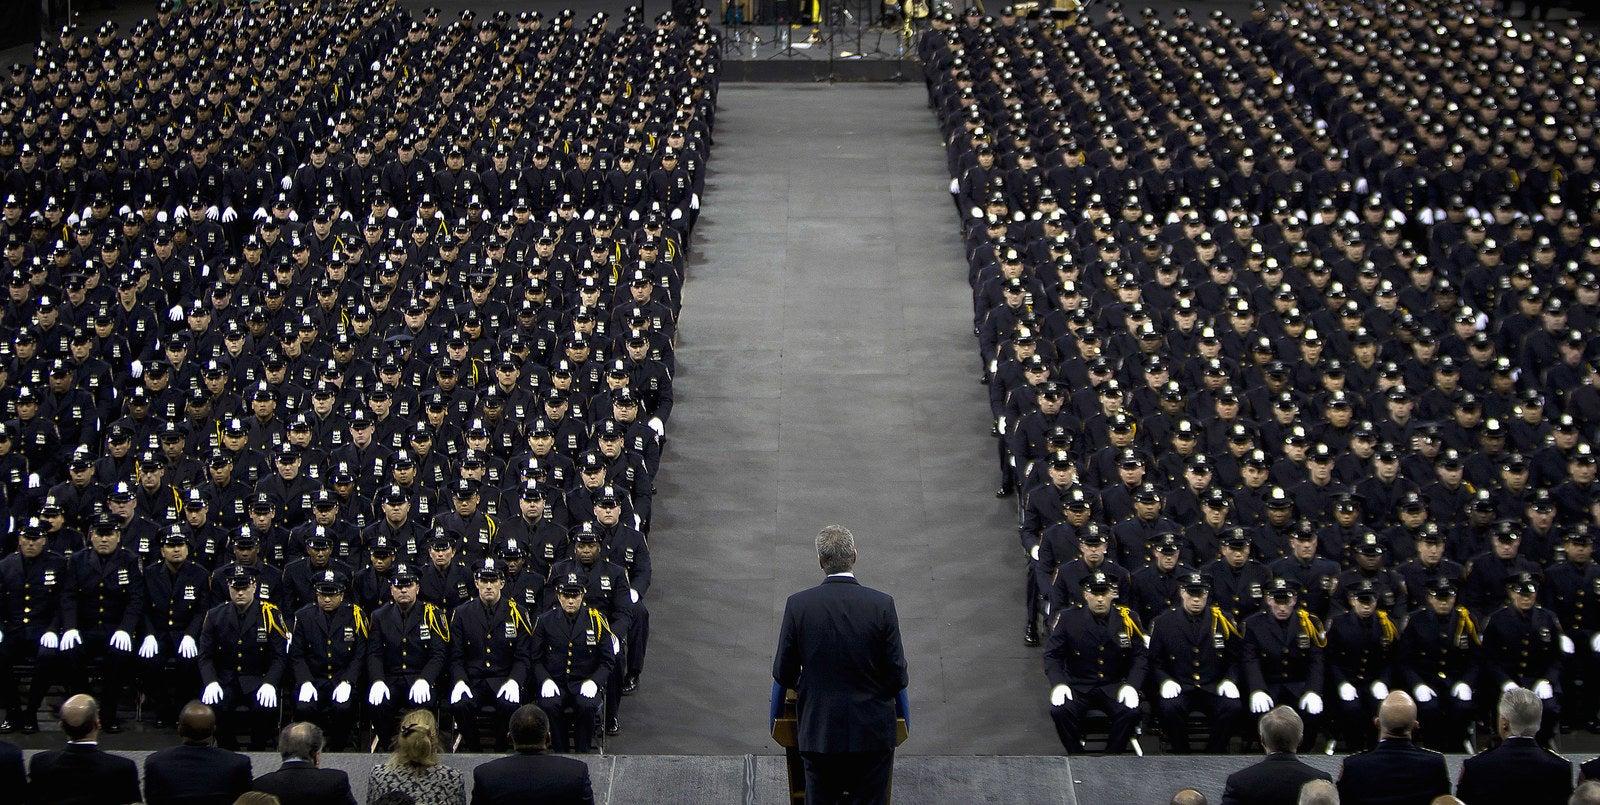 Mayor Bill de Blasio speaks to the New York City Police Academy graduating class, Dec. 29, 2014.